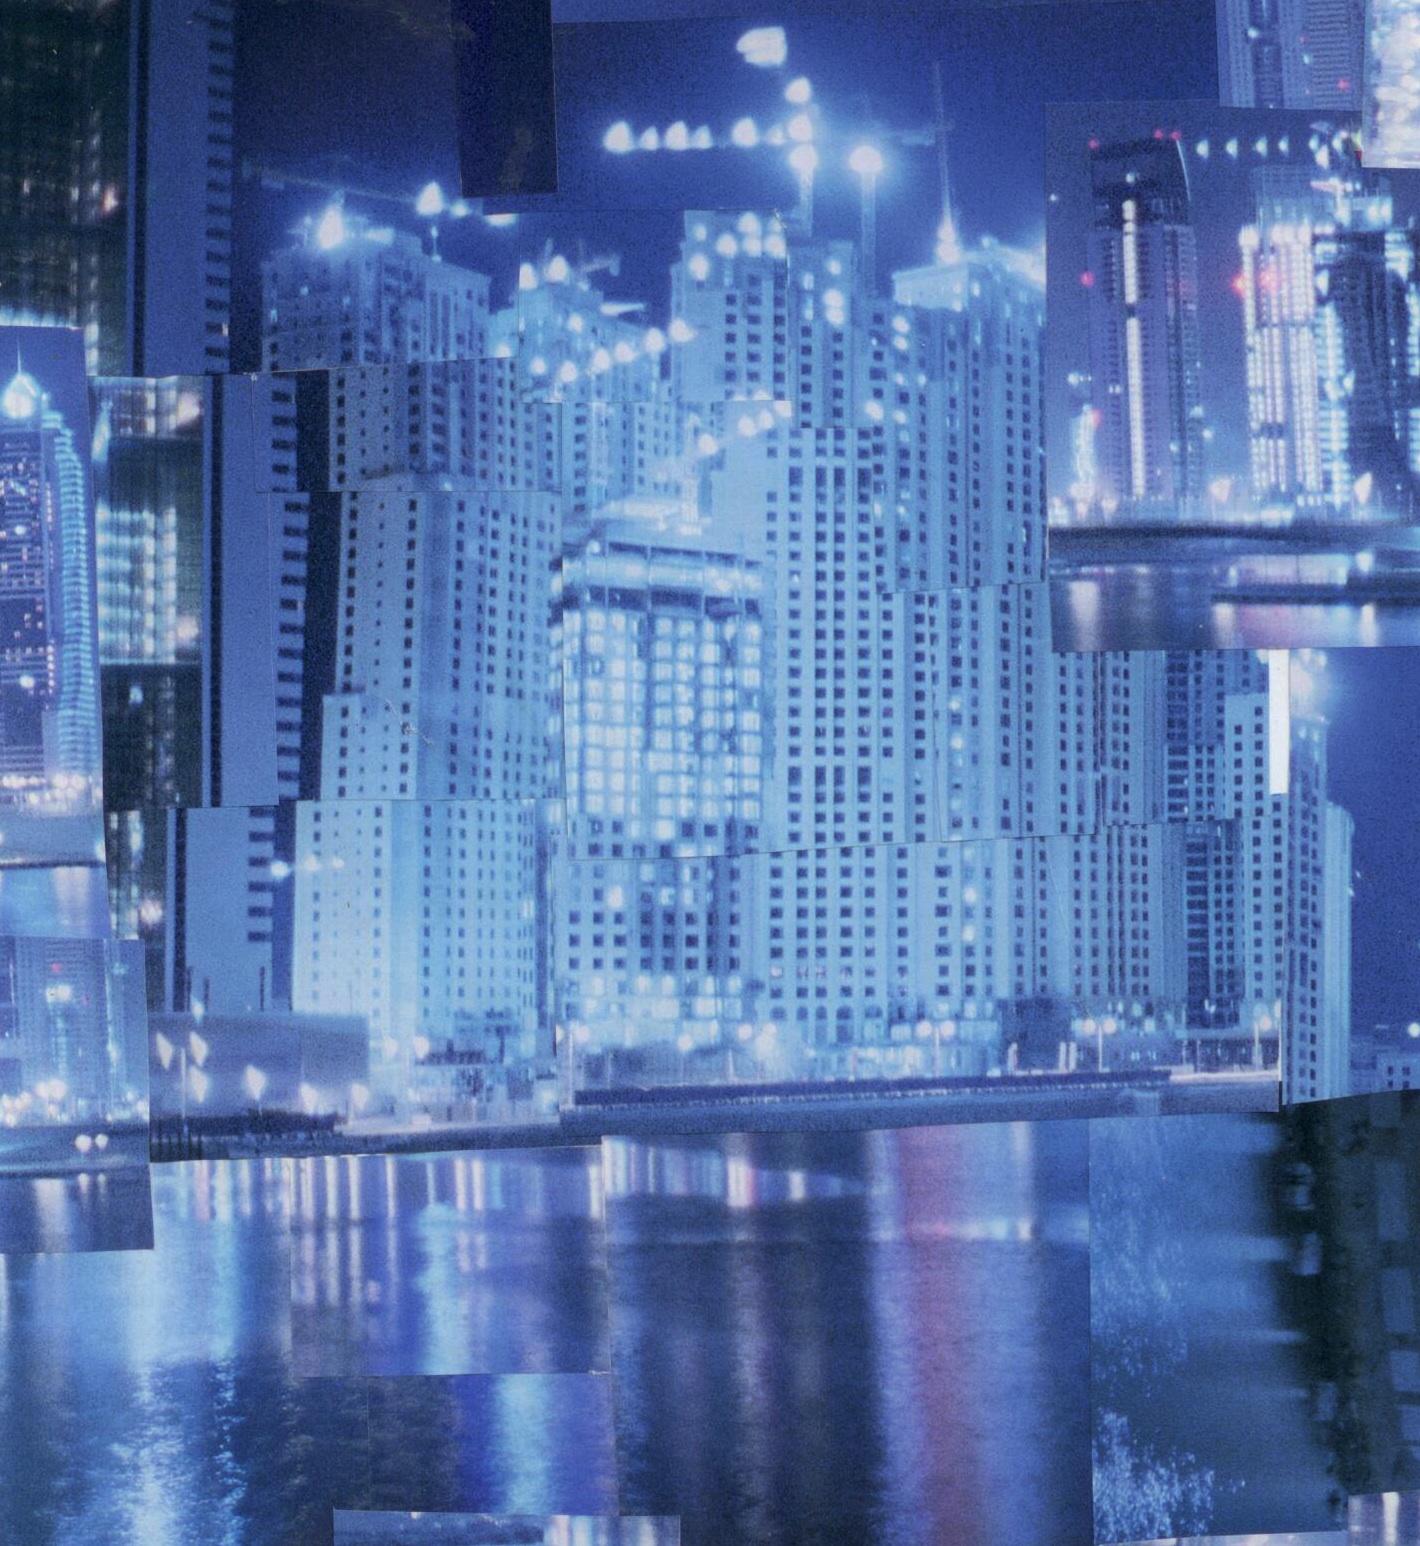 city on fire.jpg